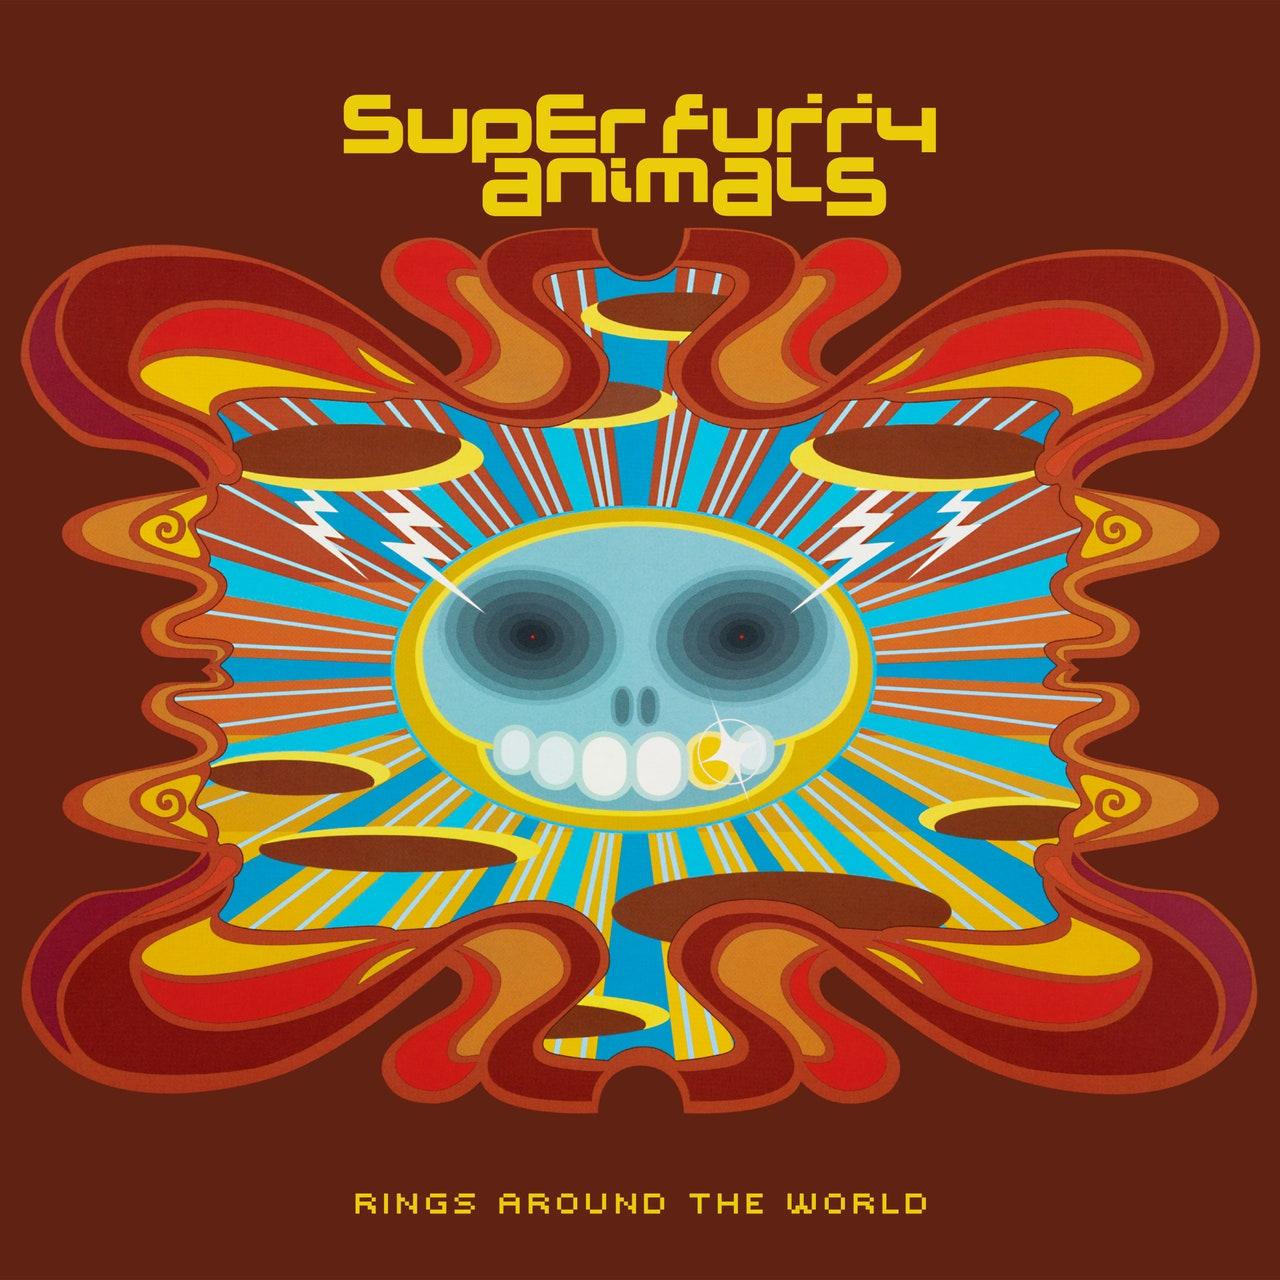 Super Furry Animals: Rings Around the World (20th Anniversary Edition)